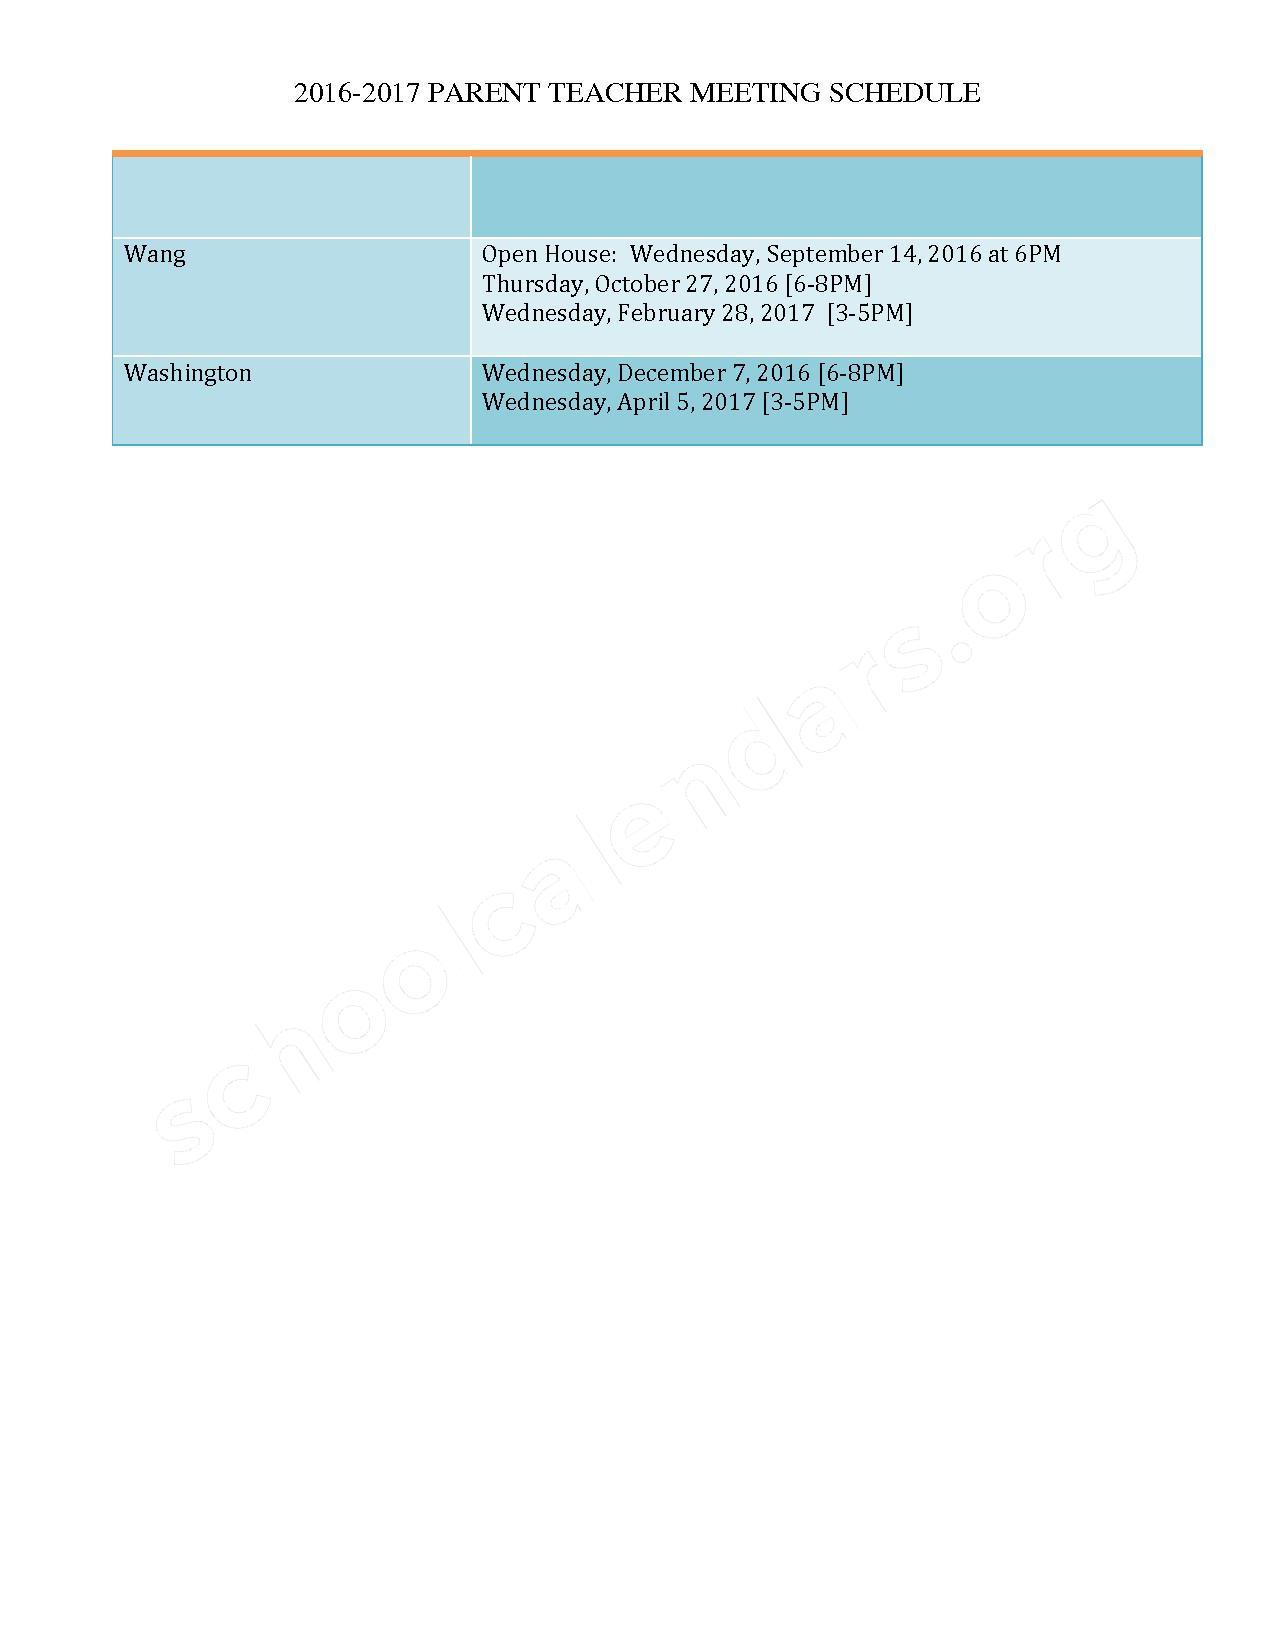 Parent Teacher Meeting Schedule 2016 - 2017 – Peter W Reilly – page 3